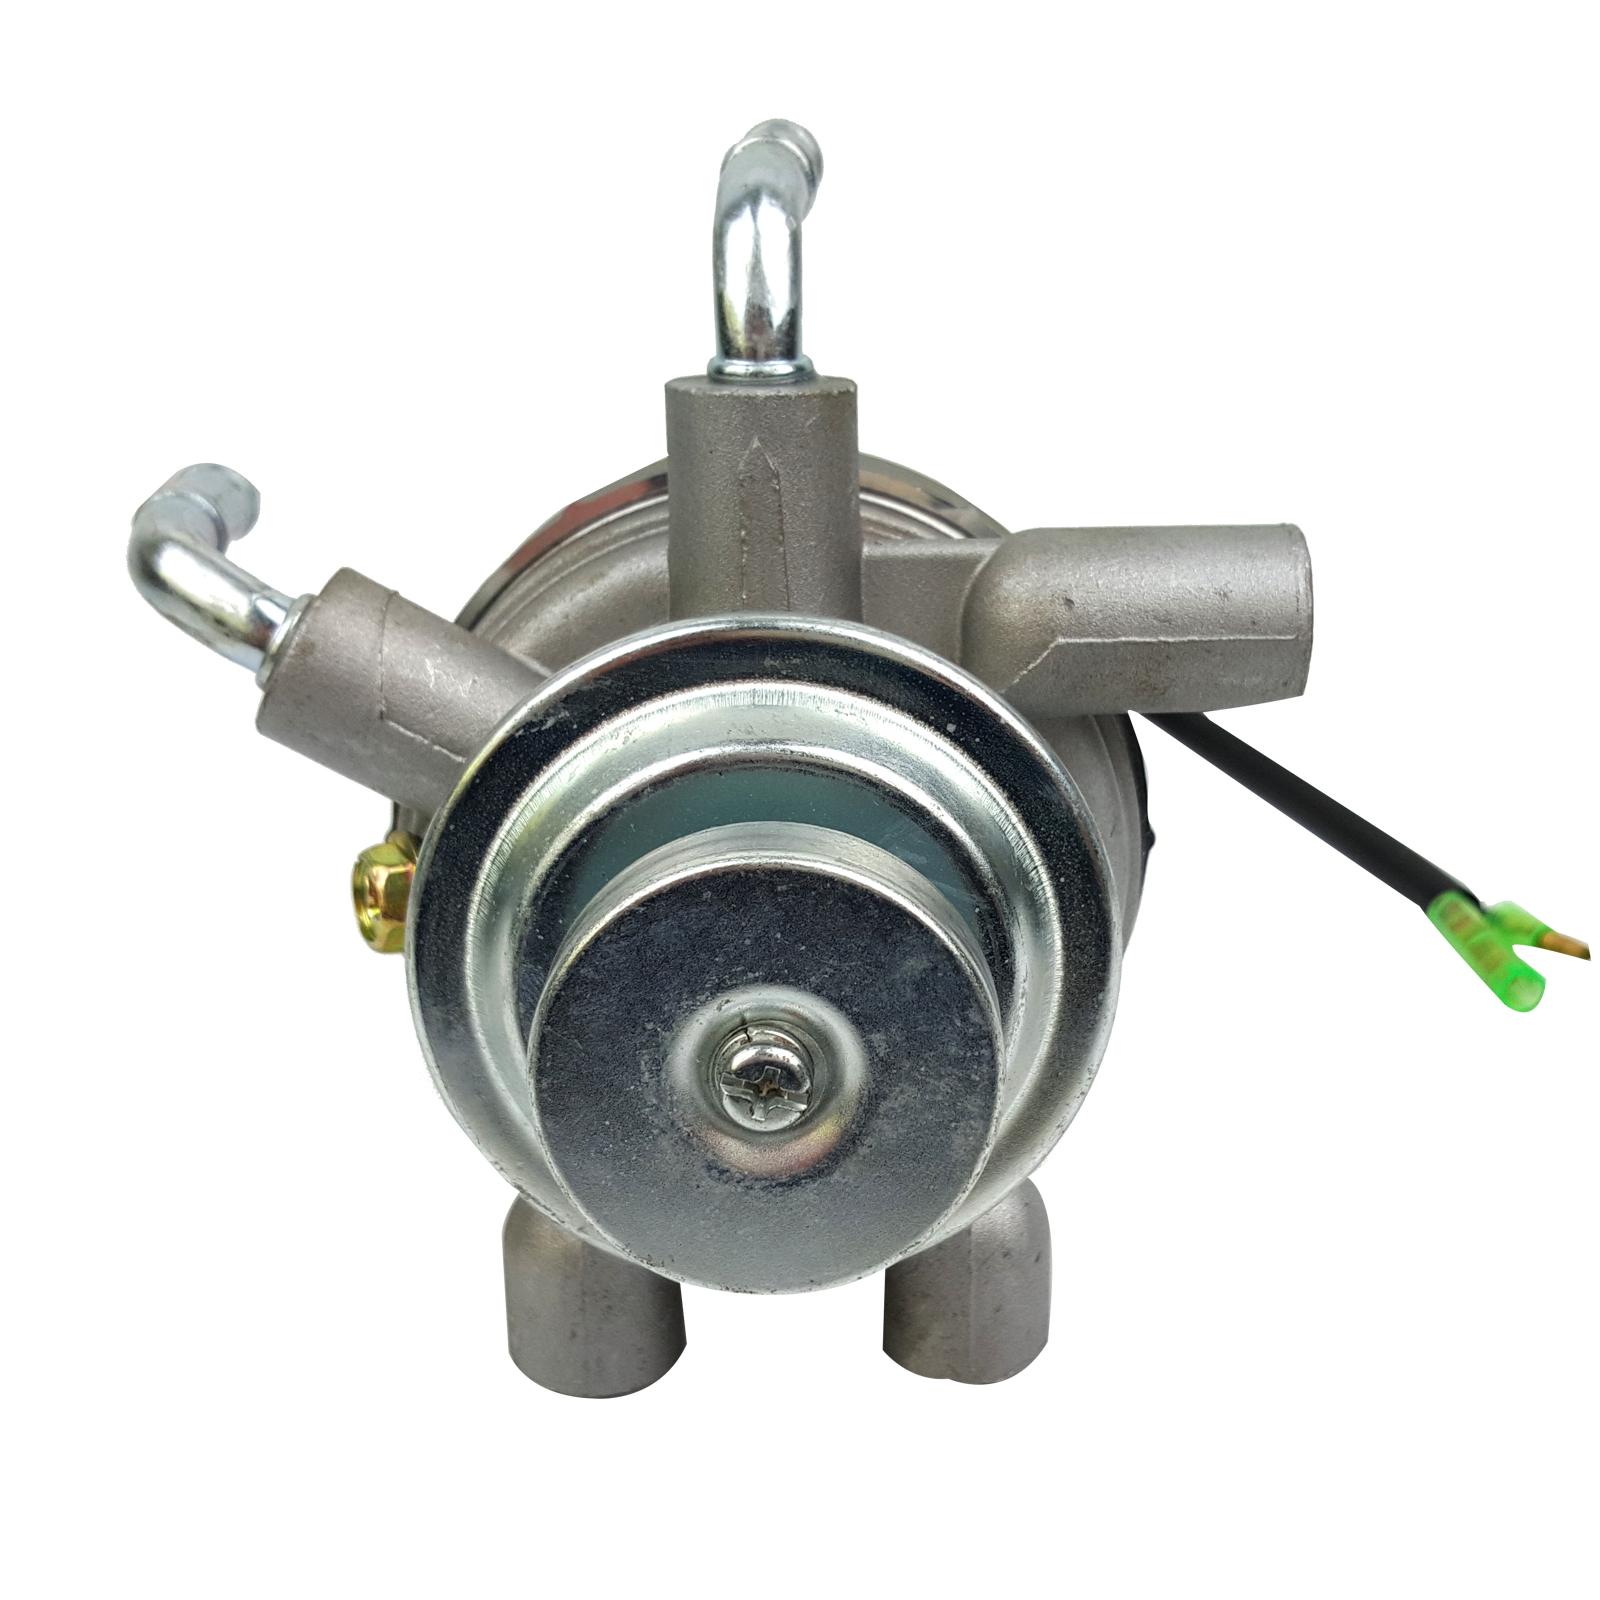 Fuel Pump Replacement : F bad fuel pressure regulator free engine